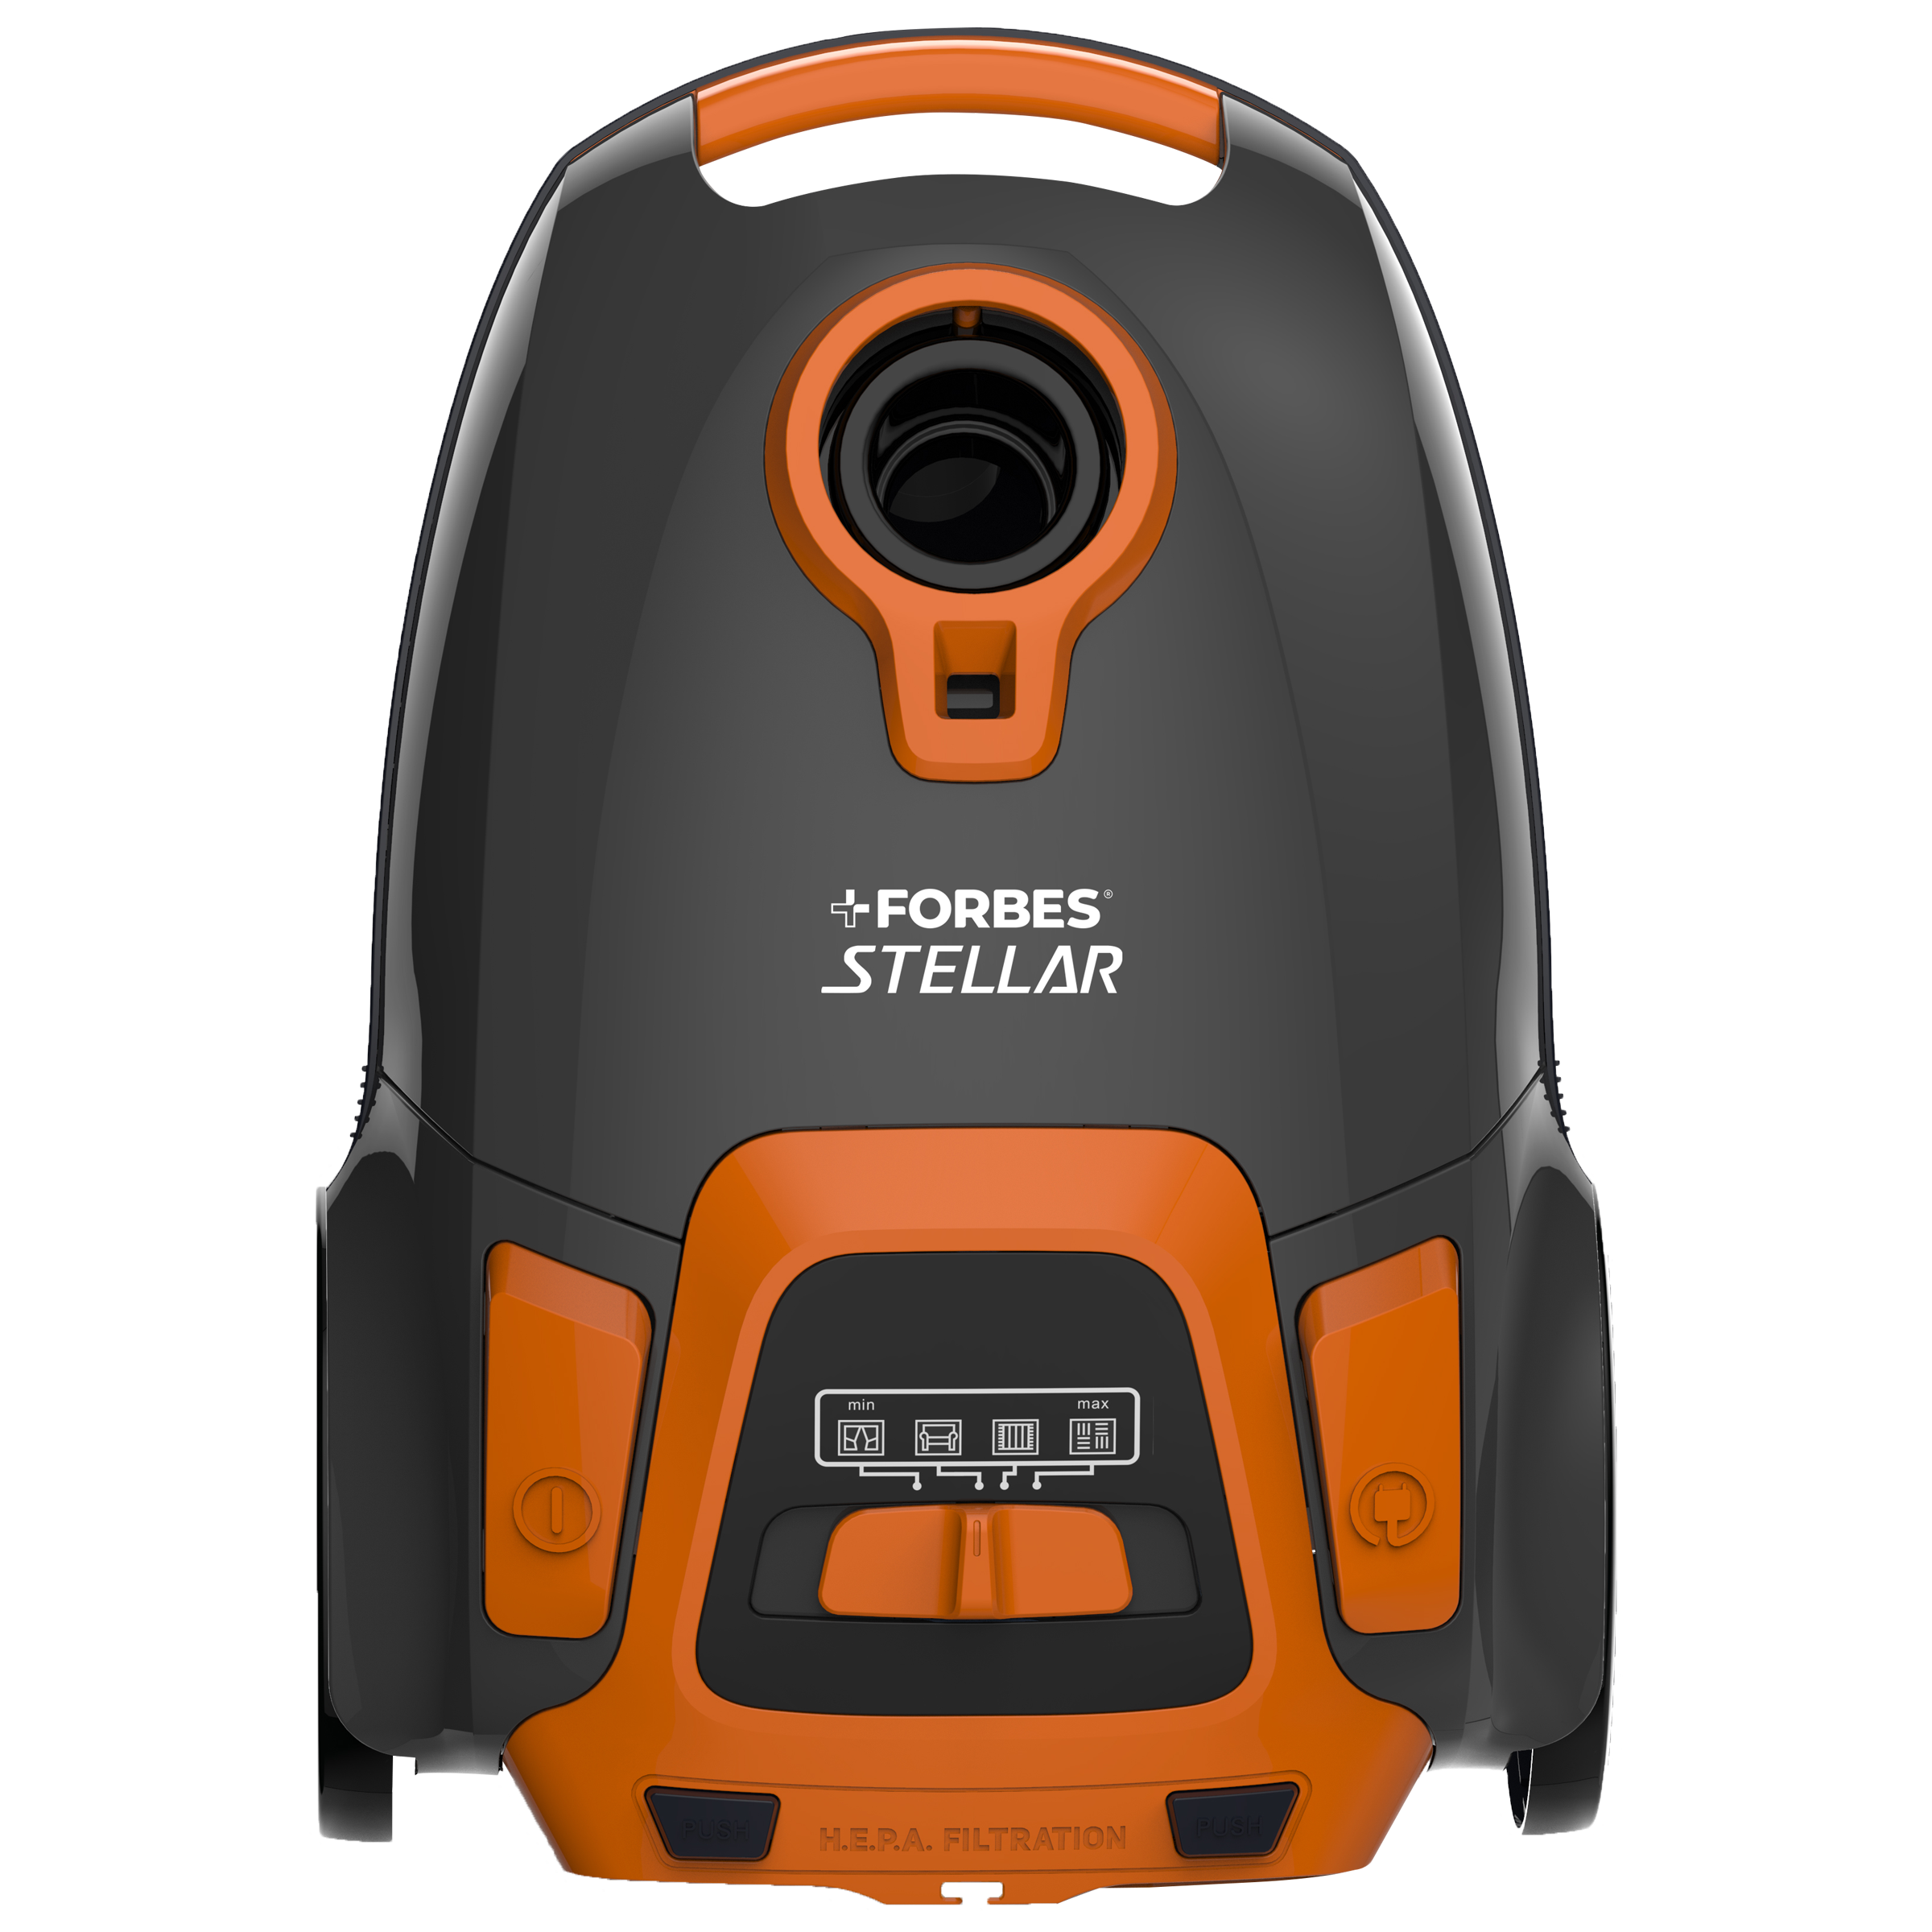 Eureka Forbes Stellar 1600 Watts Dry Vacuum Cleaner (2.5 Litres Tank, GFCDFSTER00000, Dark Grey/Orange)_1